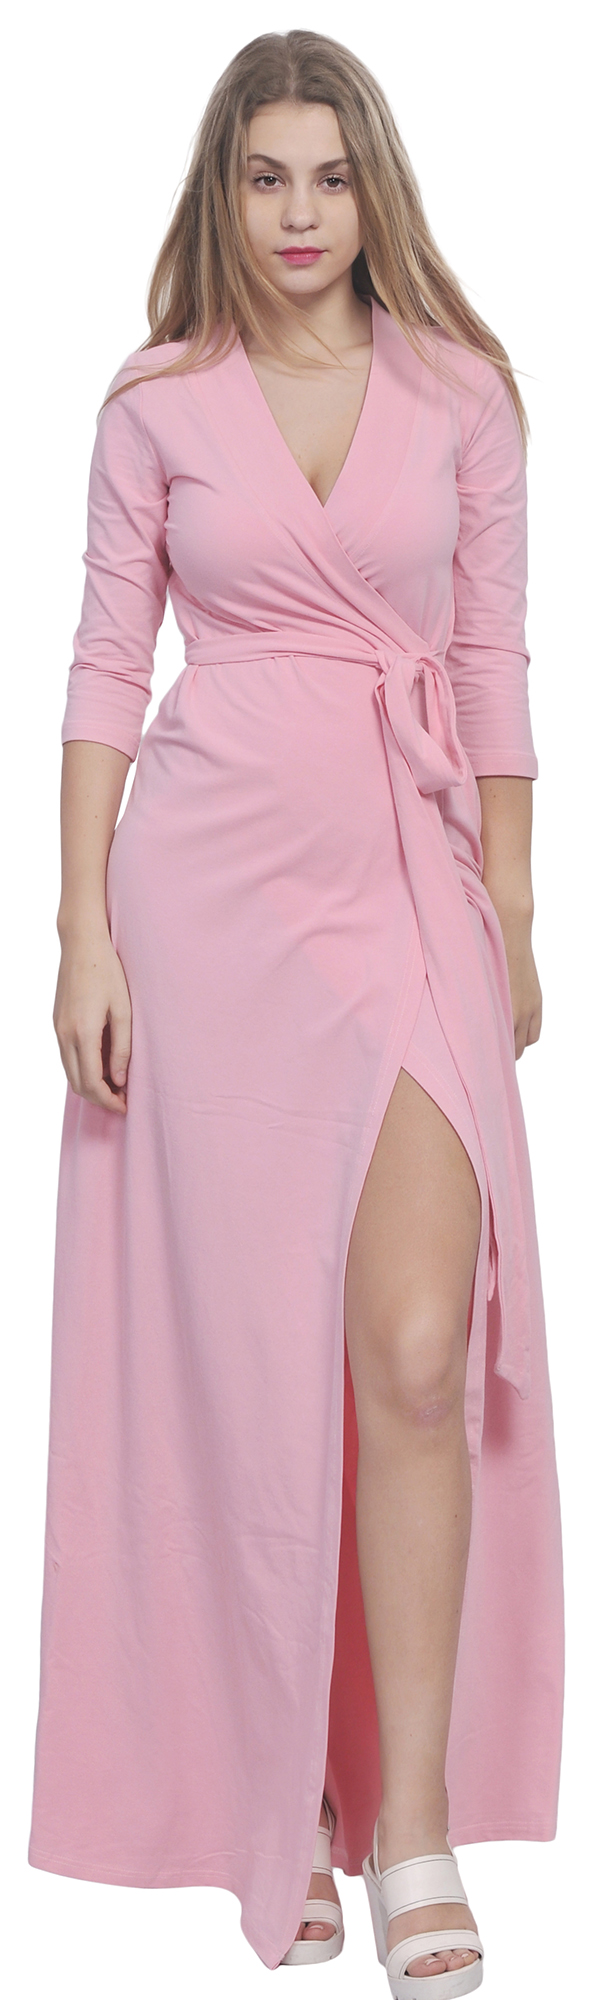 Maxi Full Length Wrap Dress Long Sleeve Crossover Dresses Casual